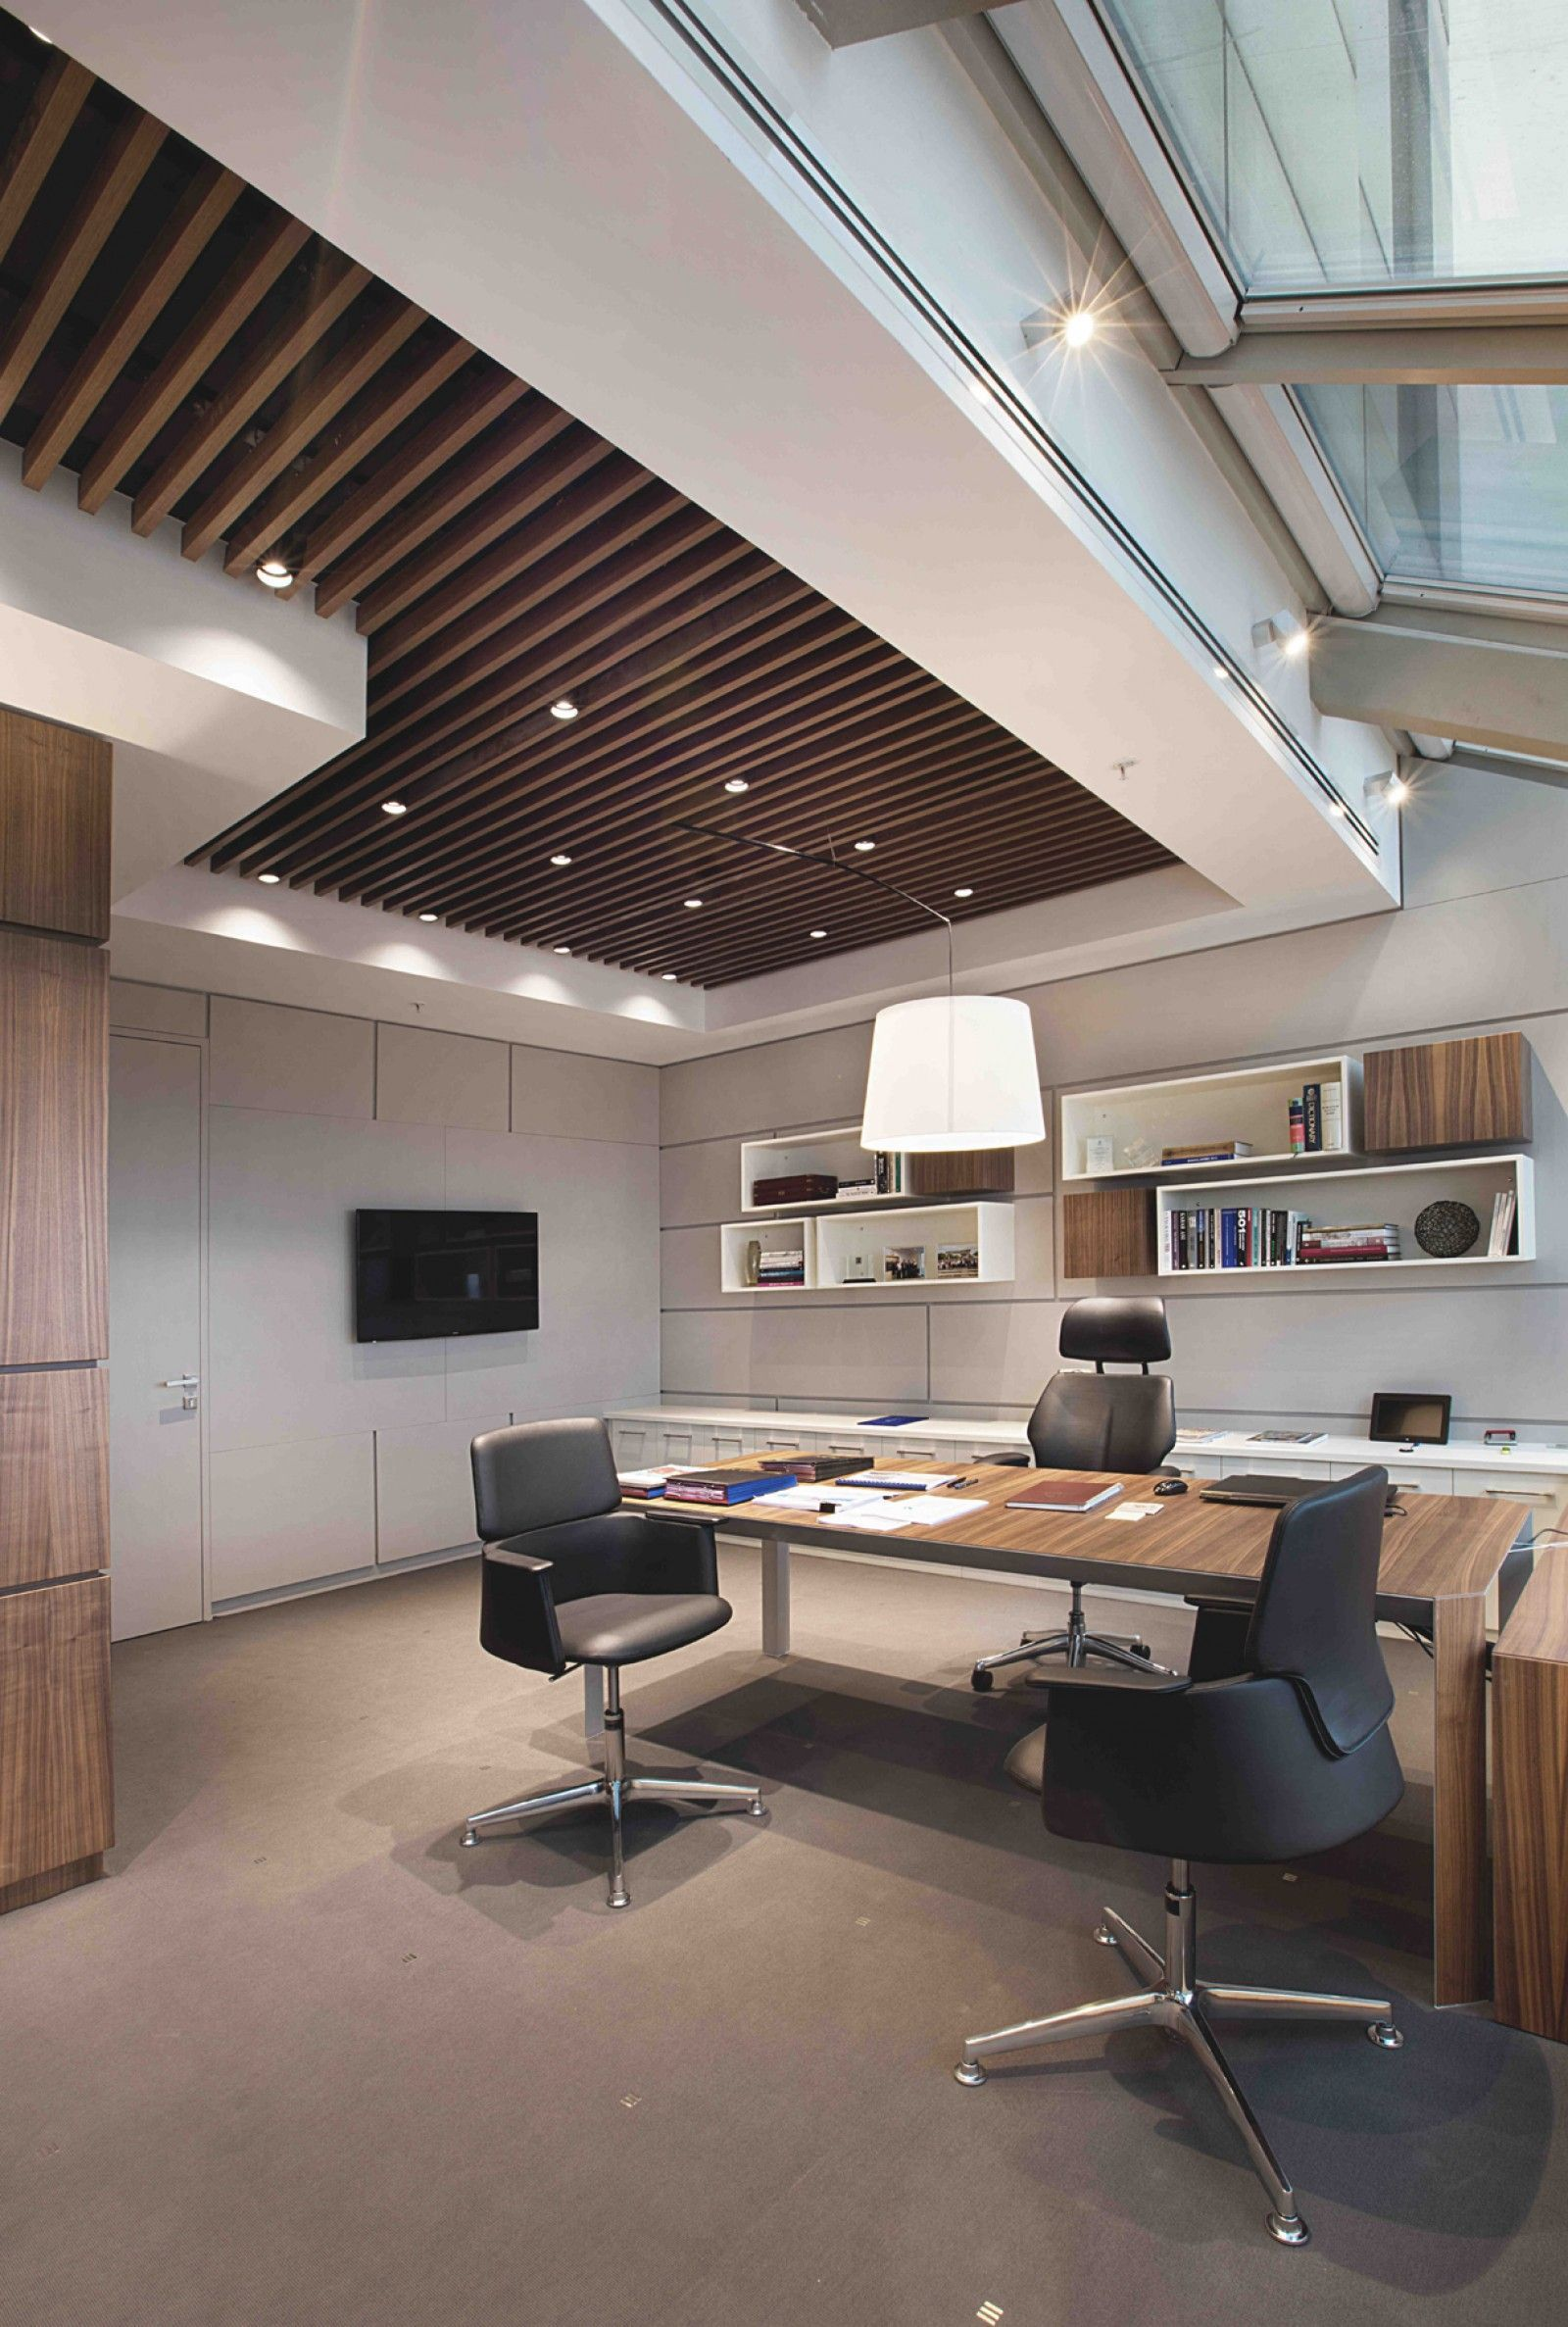 1 Top 10 Office Interior Design Ideas Furniture Photo Gallery Modern 2018 Office Interior Design Office Ceiling Design Office Interiors